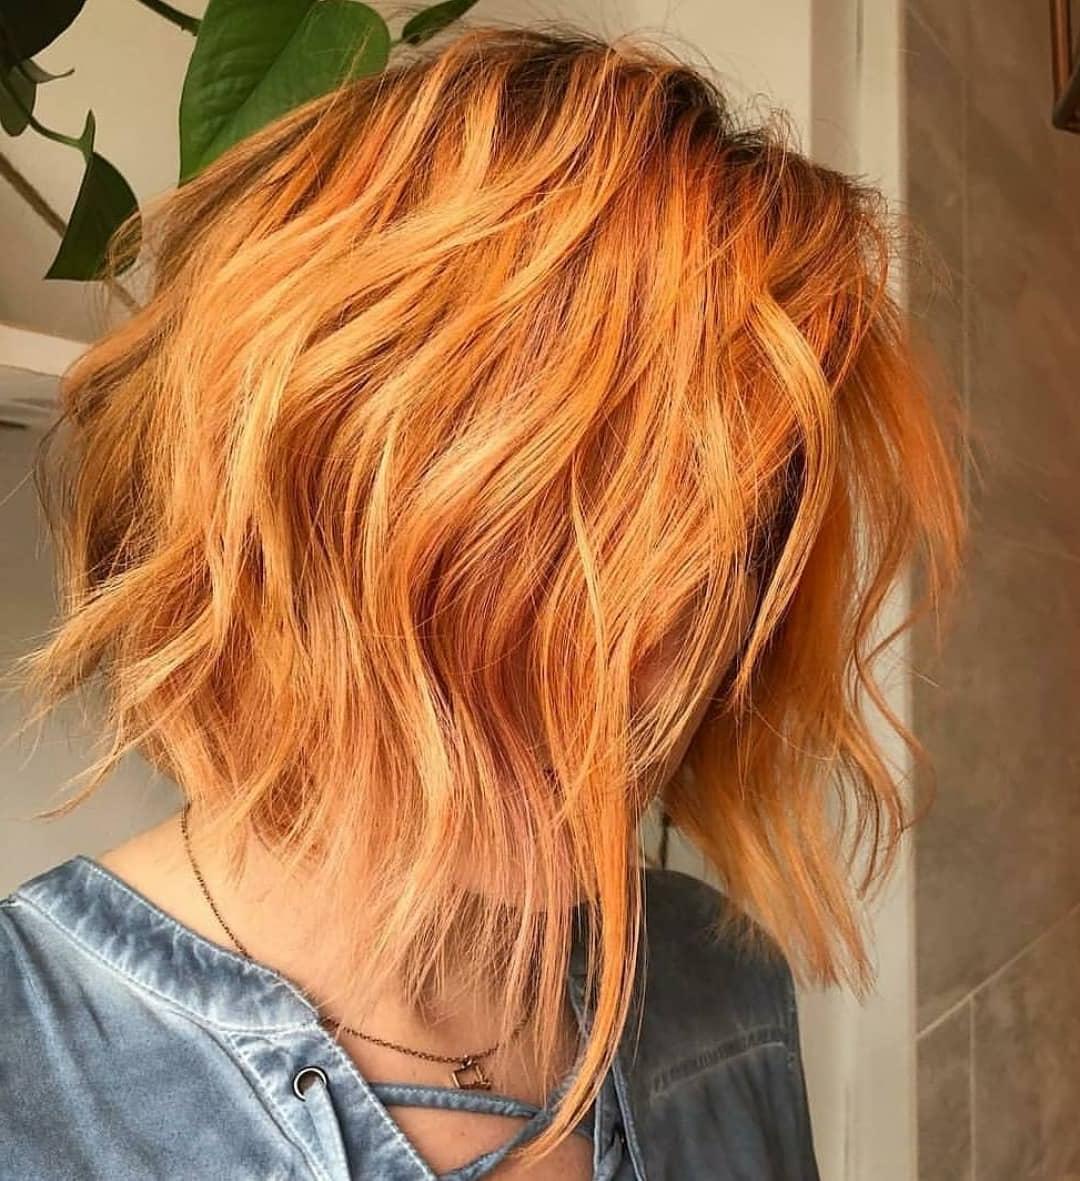 10 Trendy Choppy Lob Haircuts For Women, Best Medium Hair For Newest Tousled Auburn Bob Haircuts (View 8 of 20)